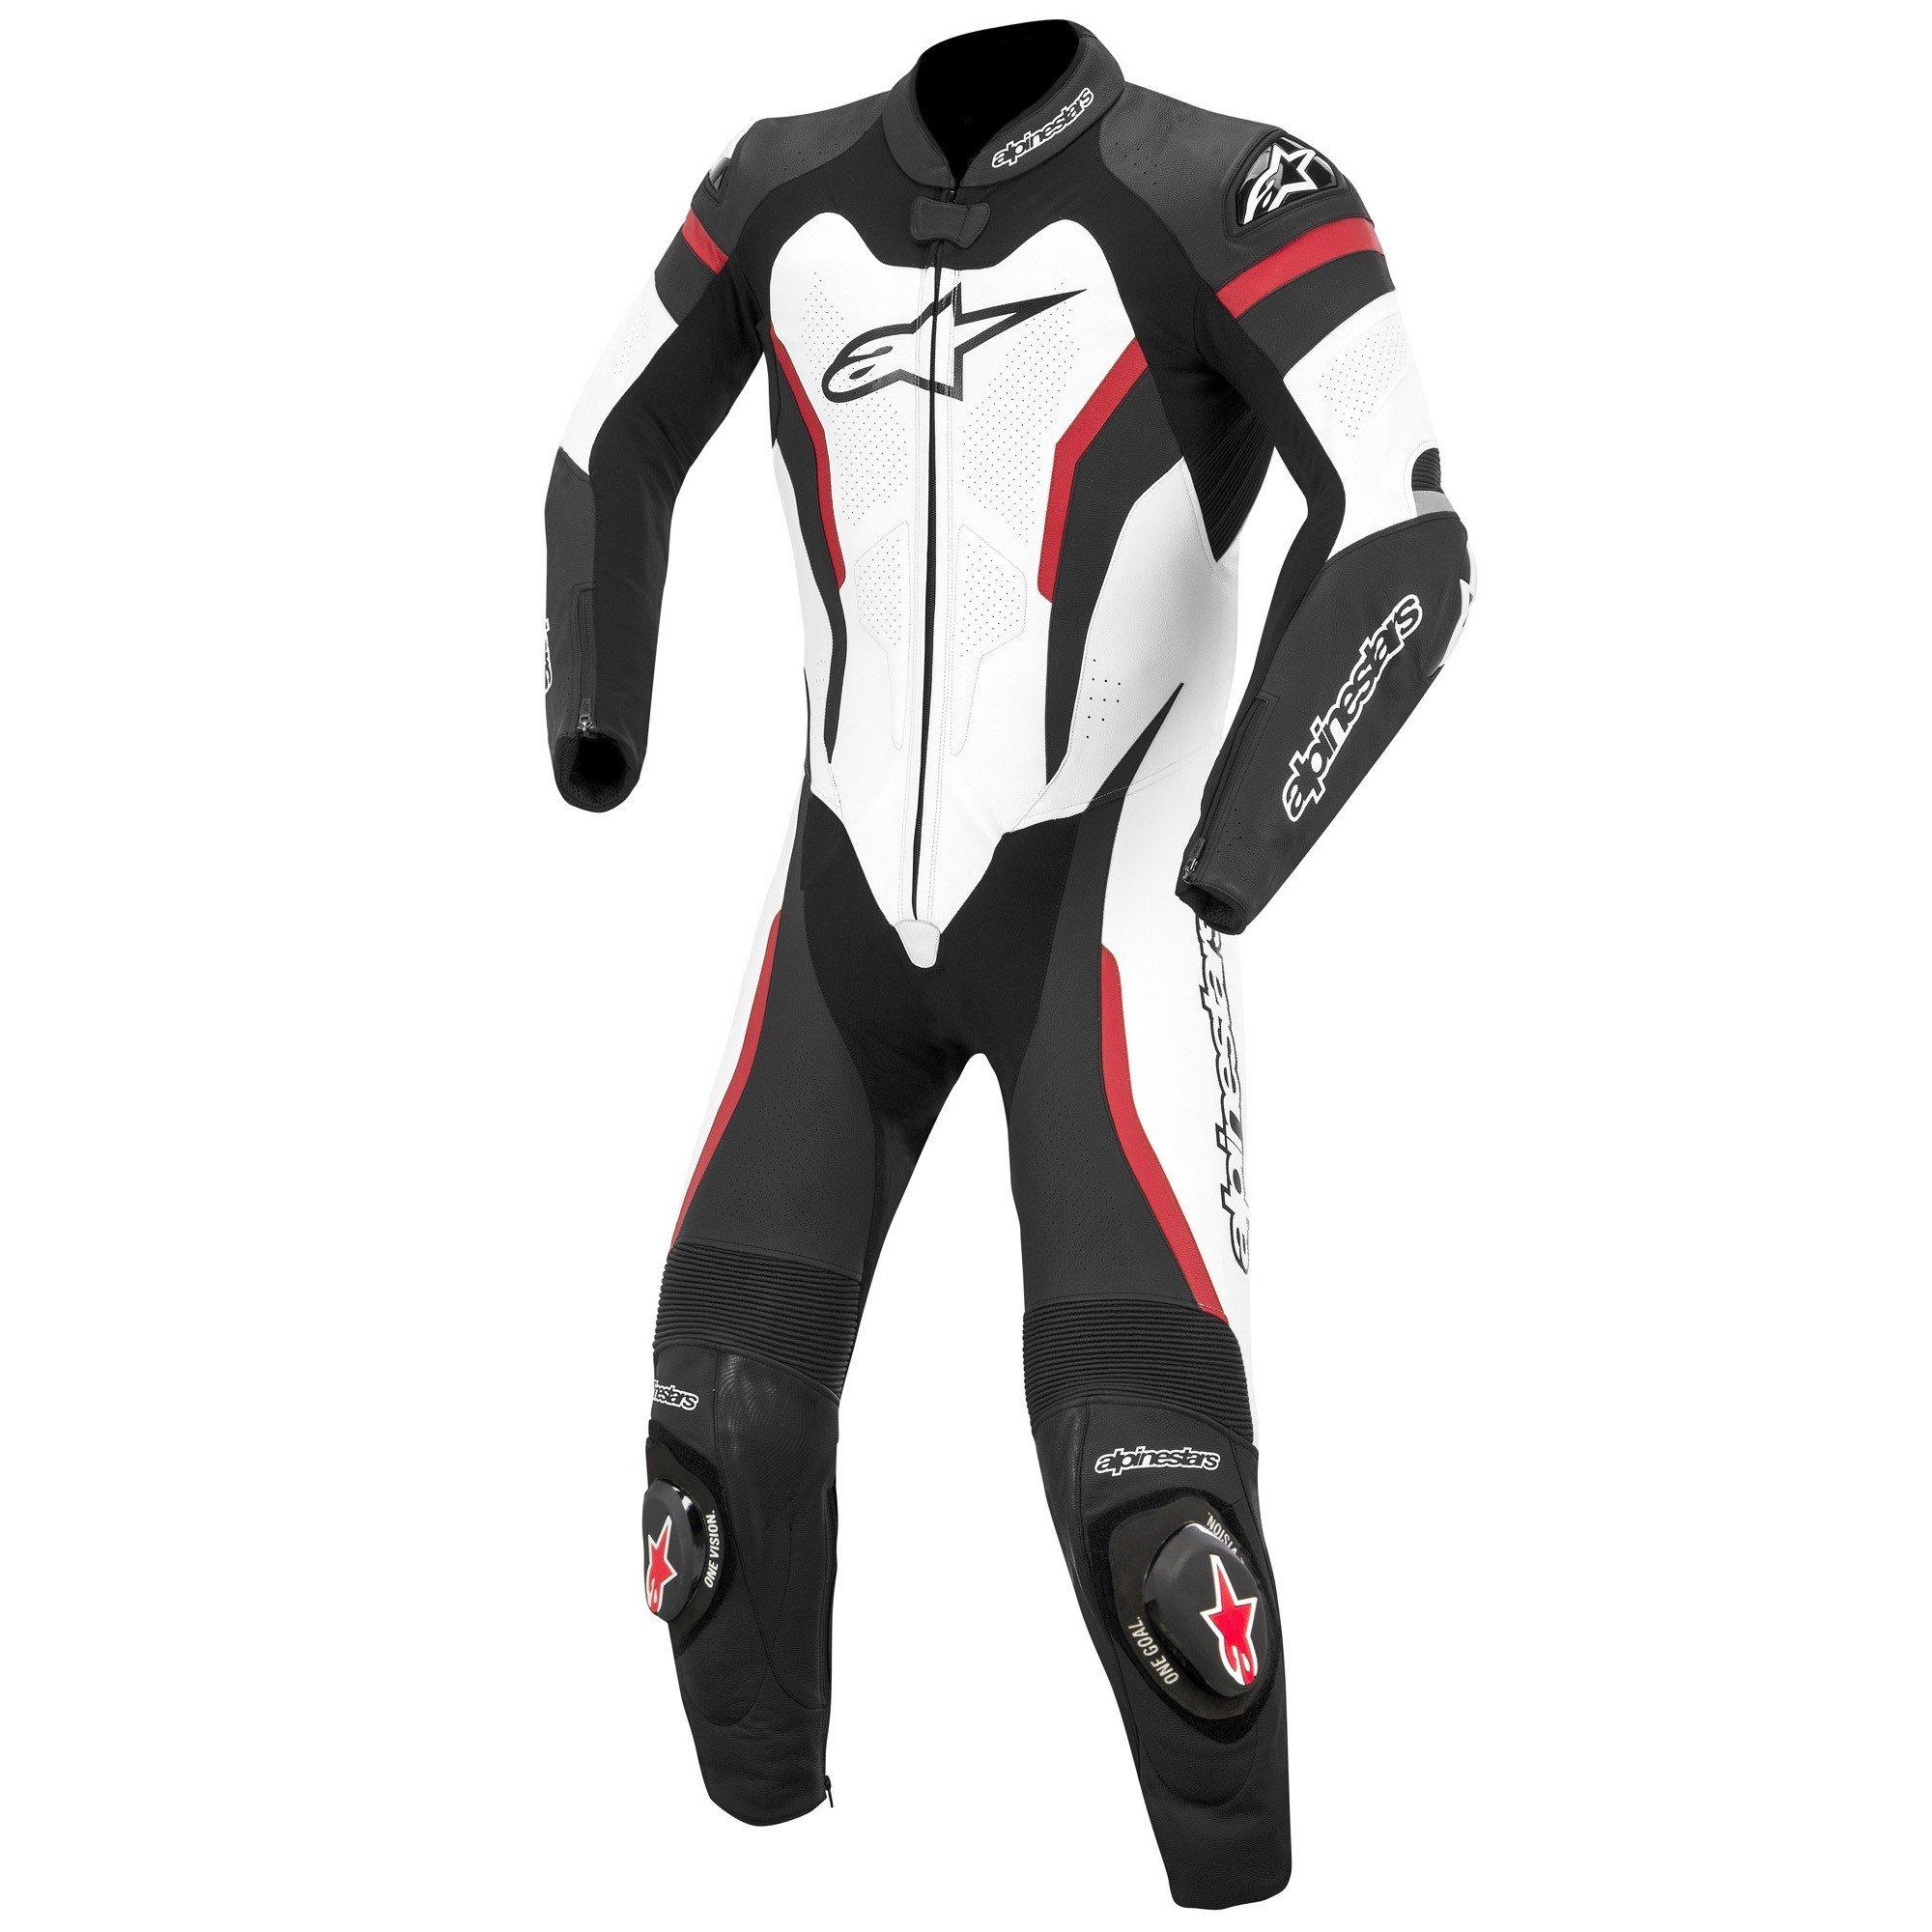 Alpinestars GP Pro P Pro 1PC Black/White/Red 52